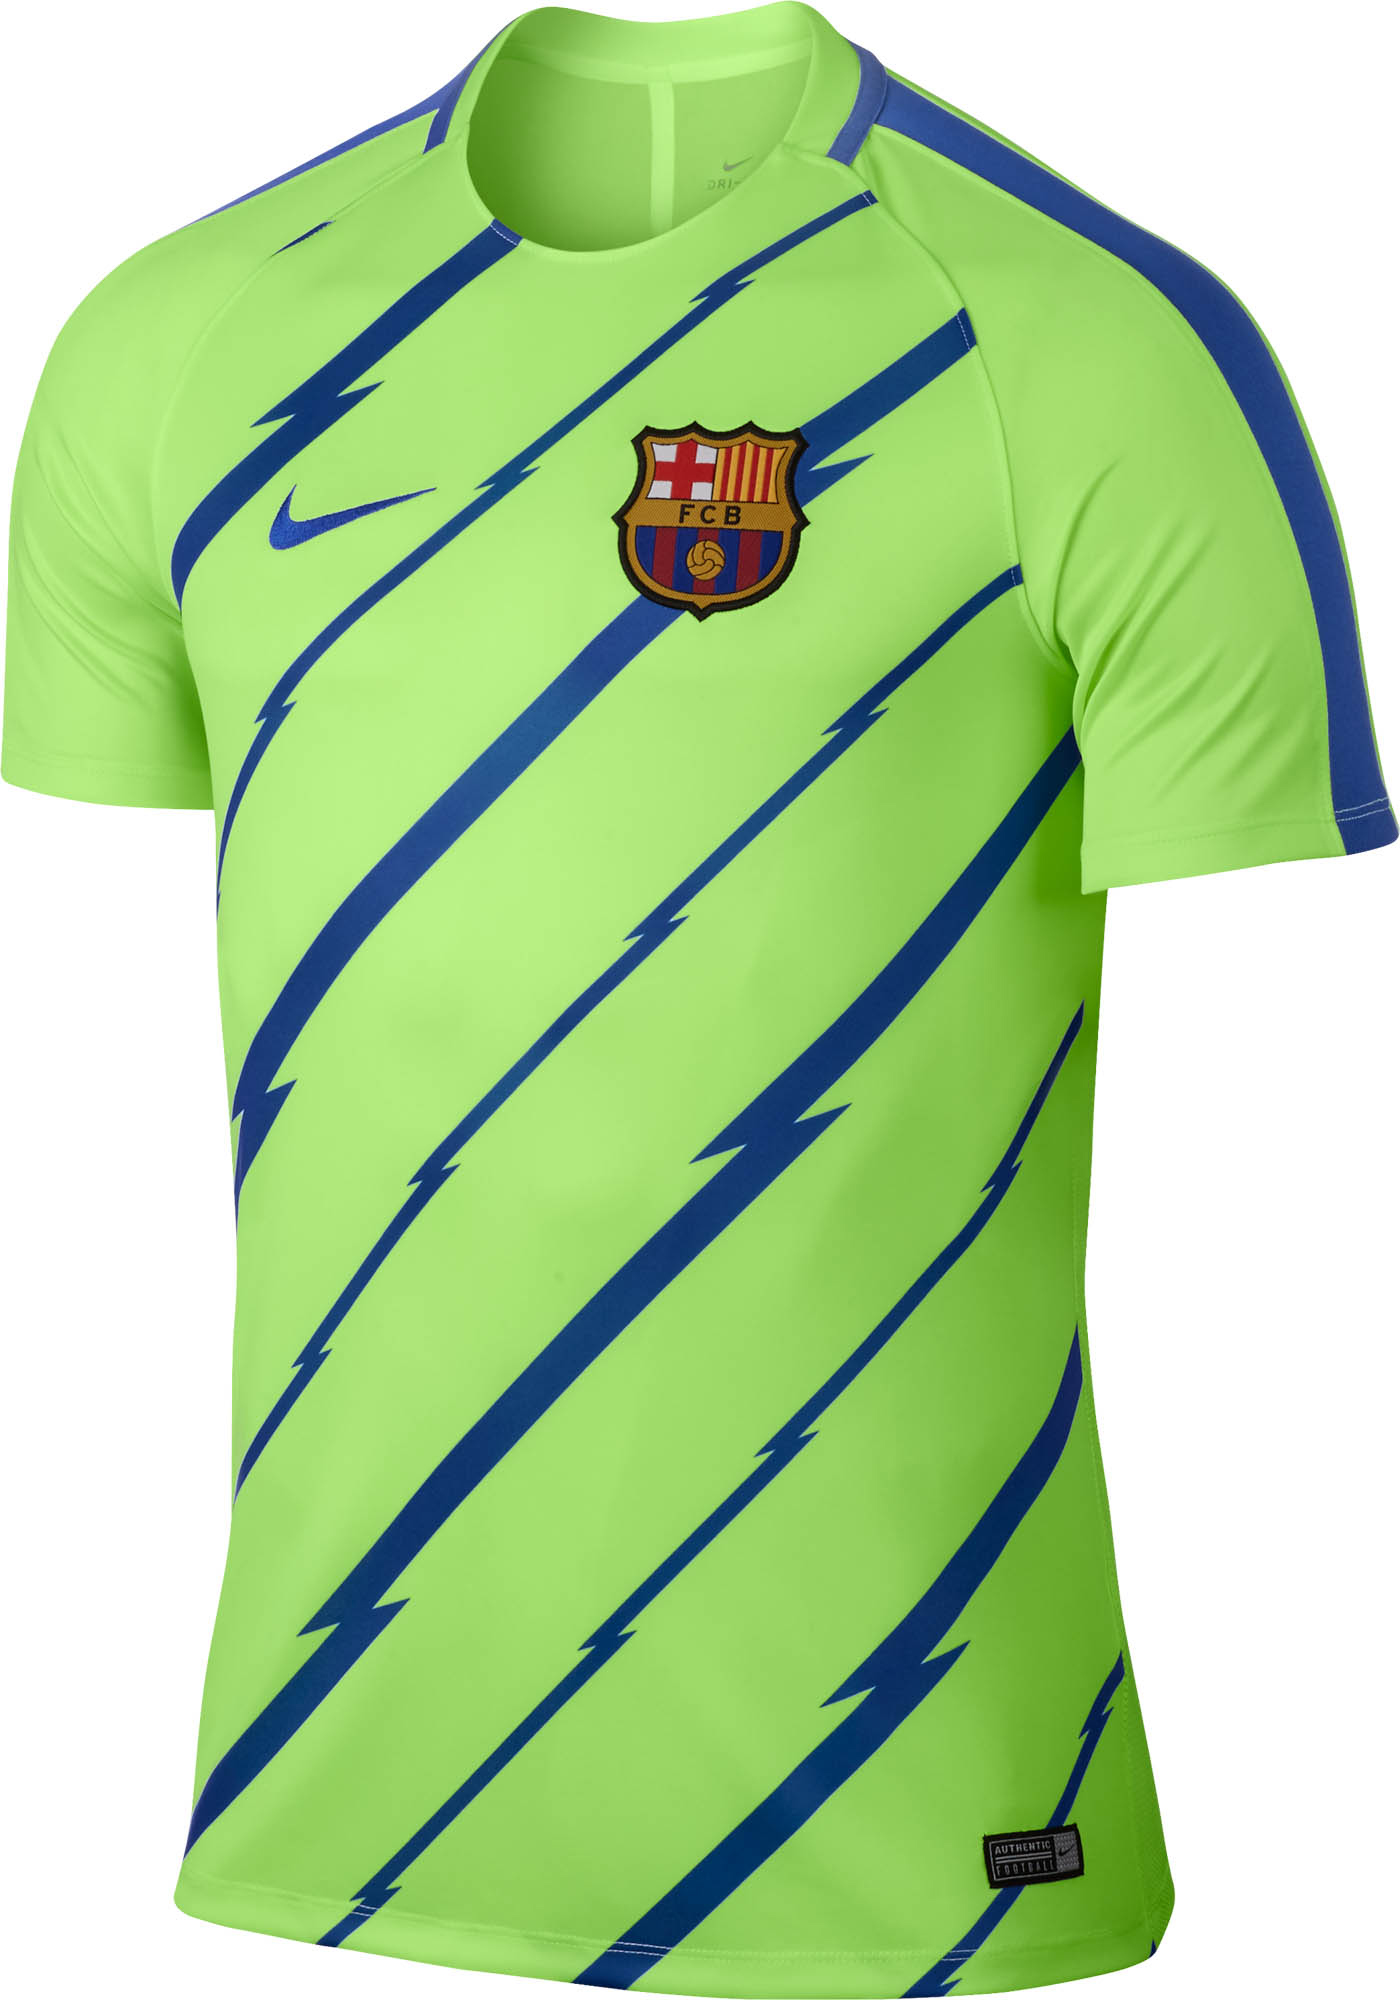 5f431e1ab6d Nike Barcelona Breathe Training Top - Ghost Green & Game Royal ...